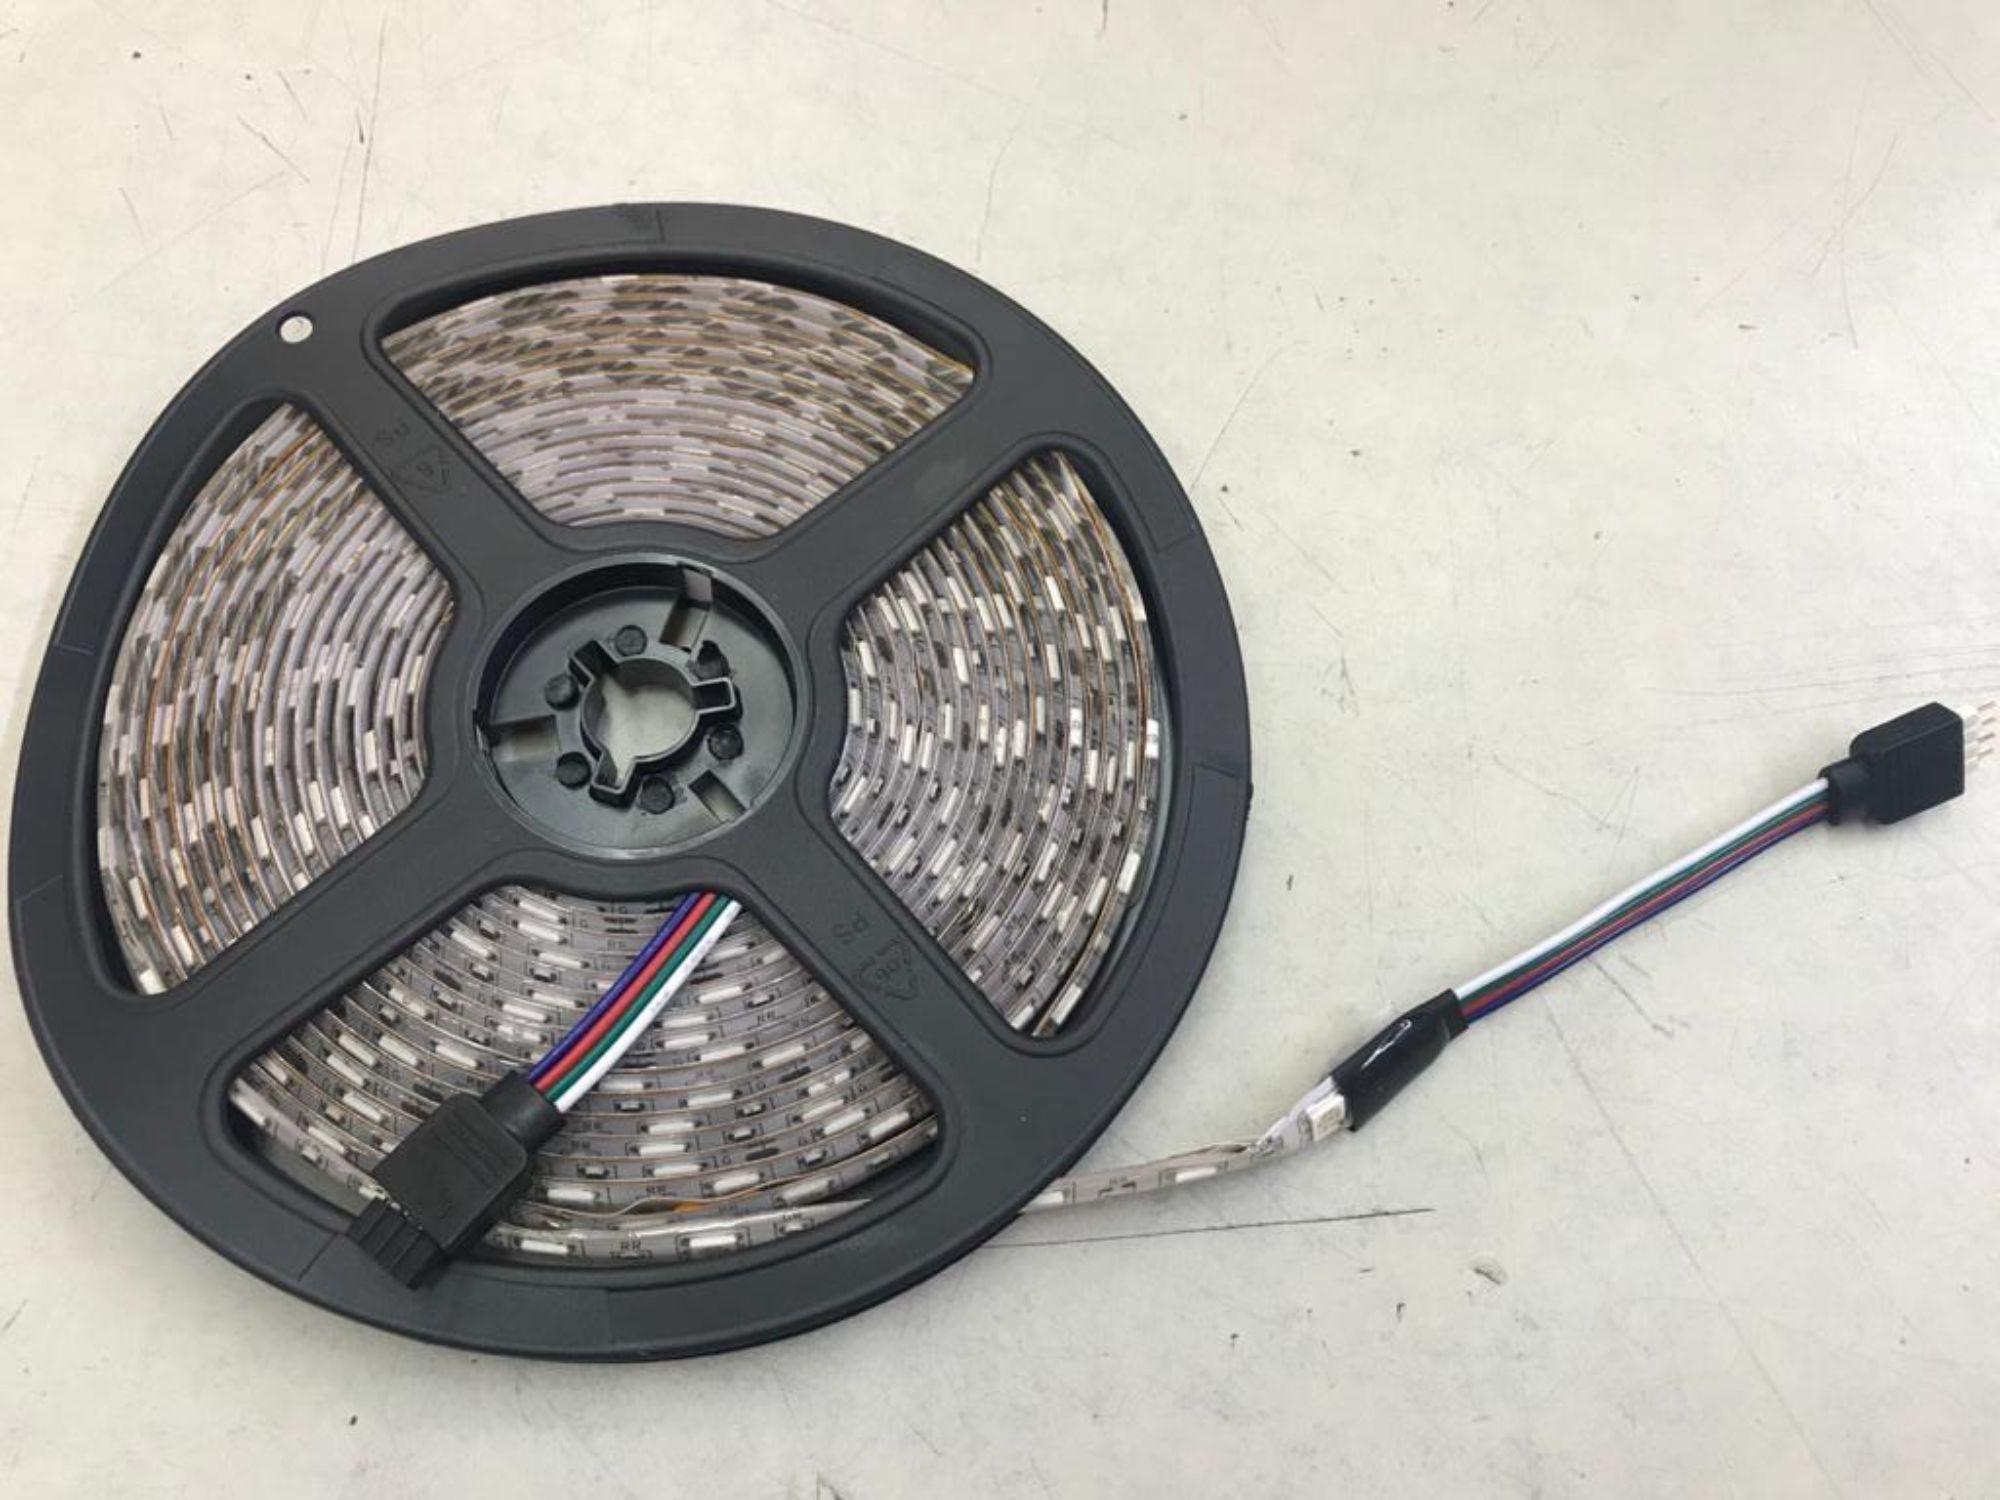 FITA LED RGB COM 5 METROS COMPLETA